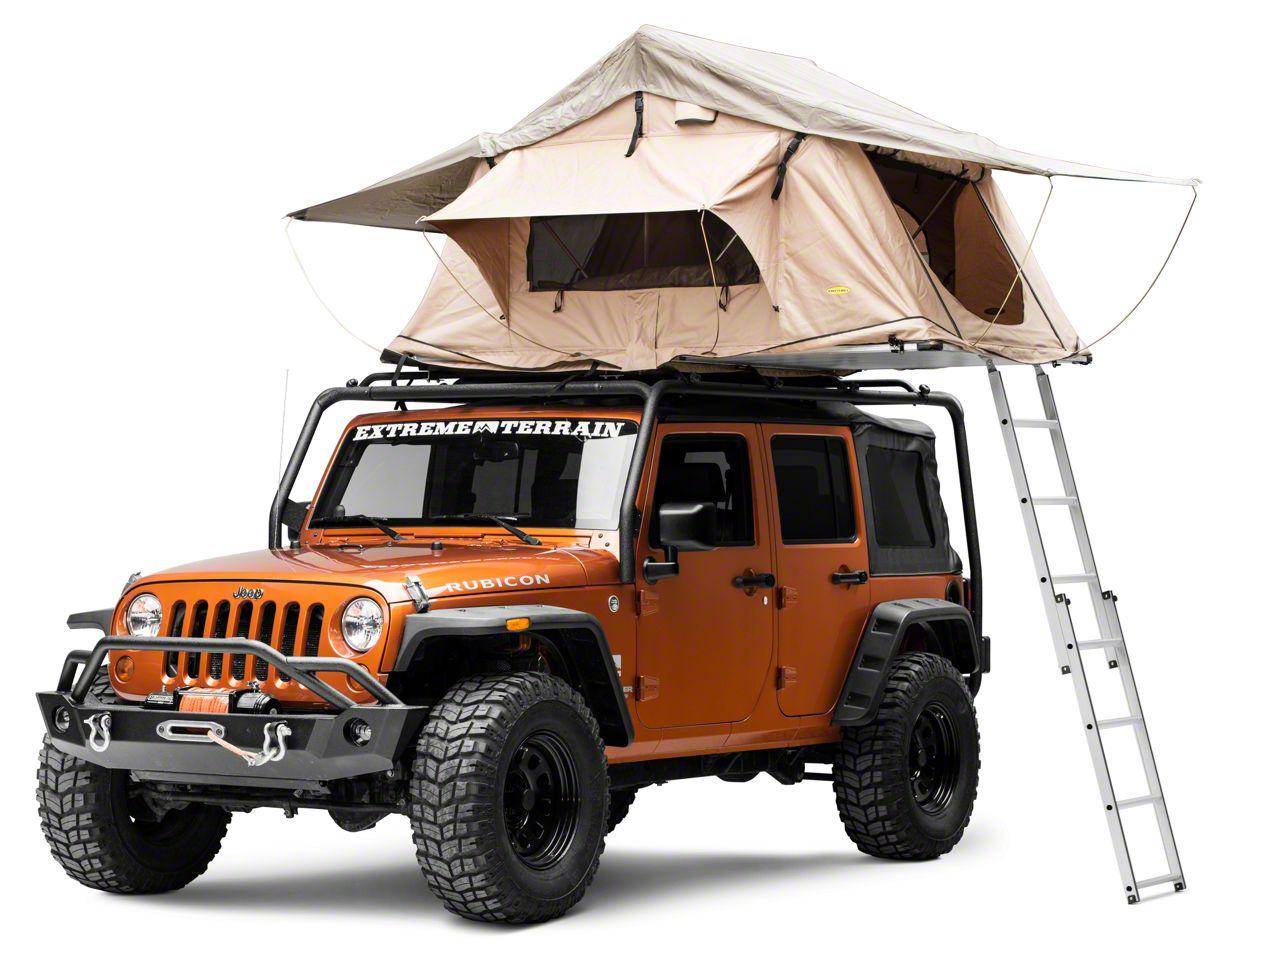 Smittybilt Overlander Roof Tent